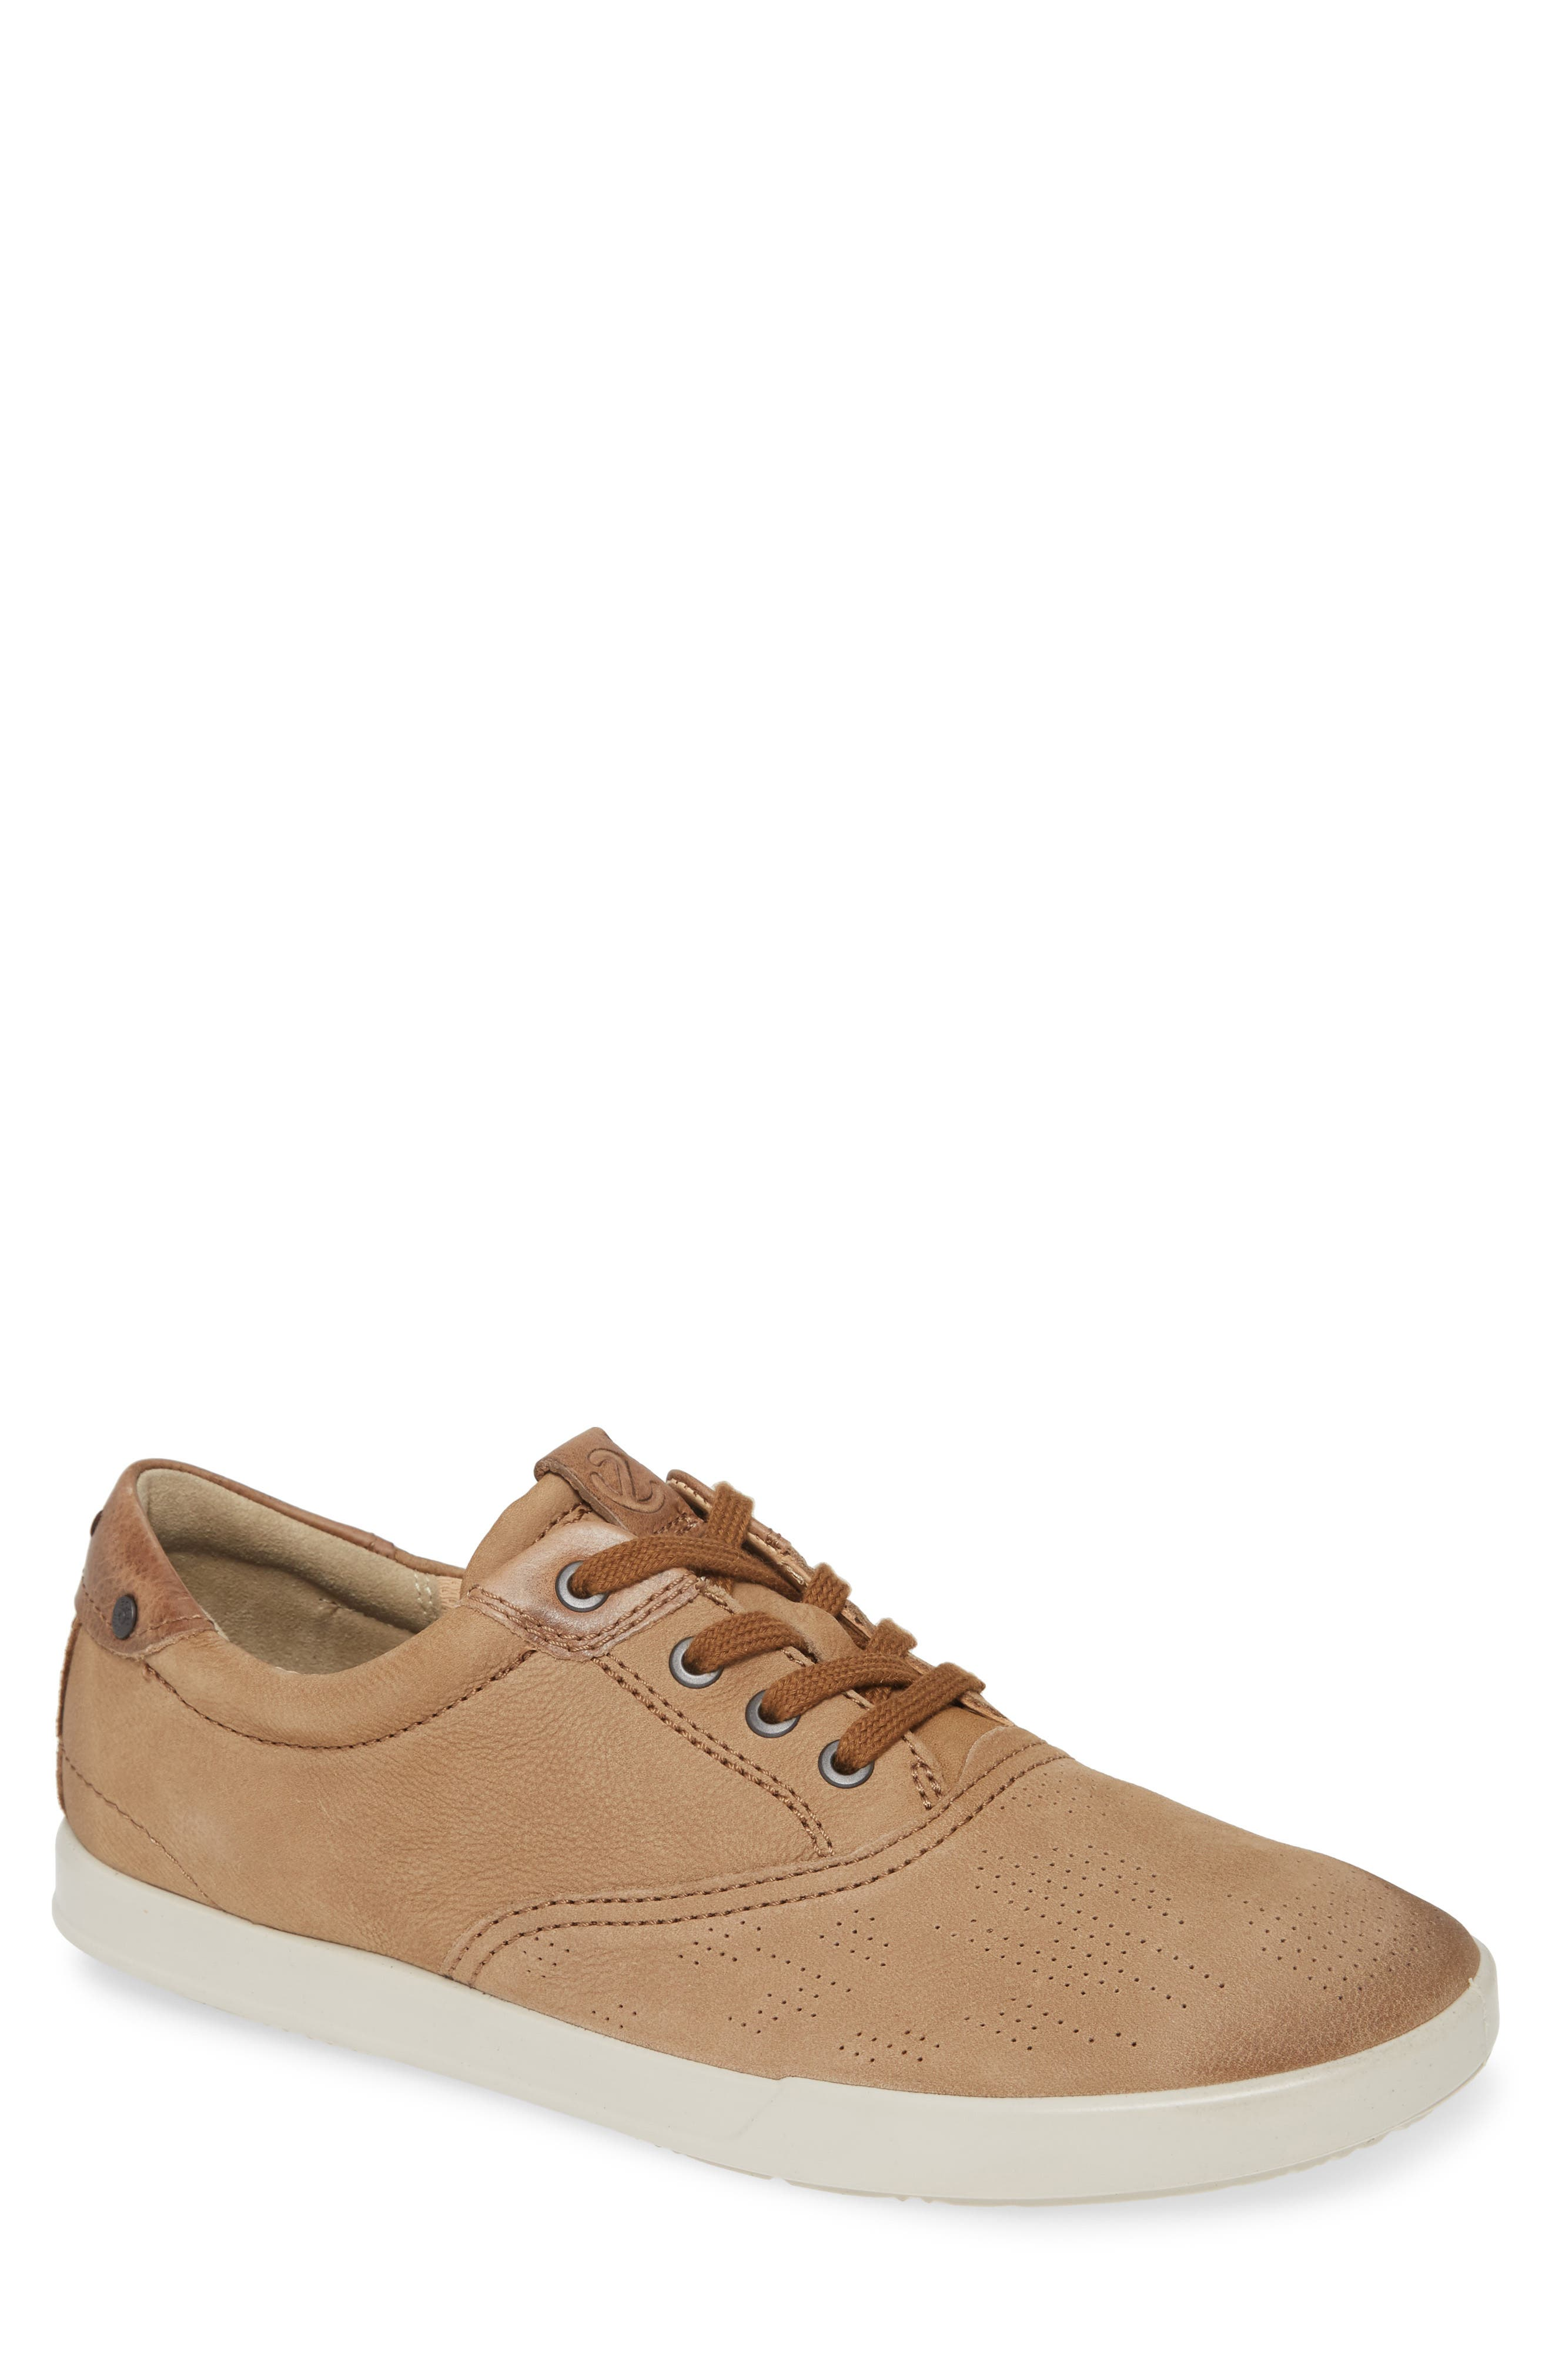 Men's Ecco Collin 2.0 Cvo Low Top Sneaker